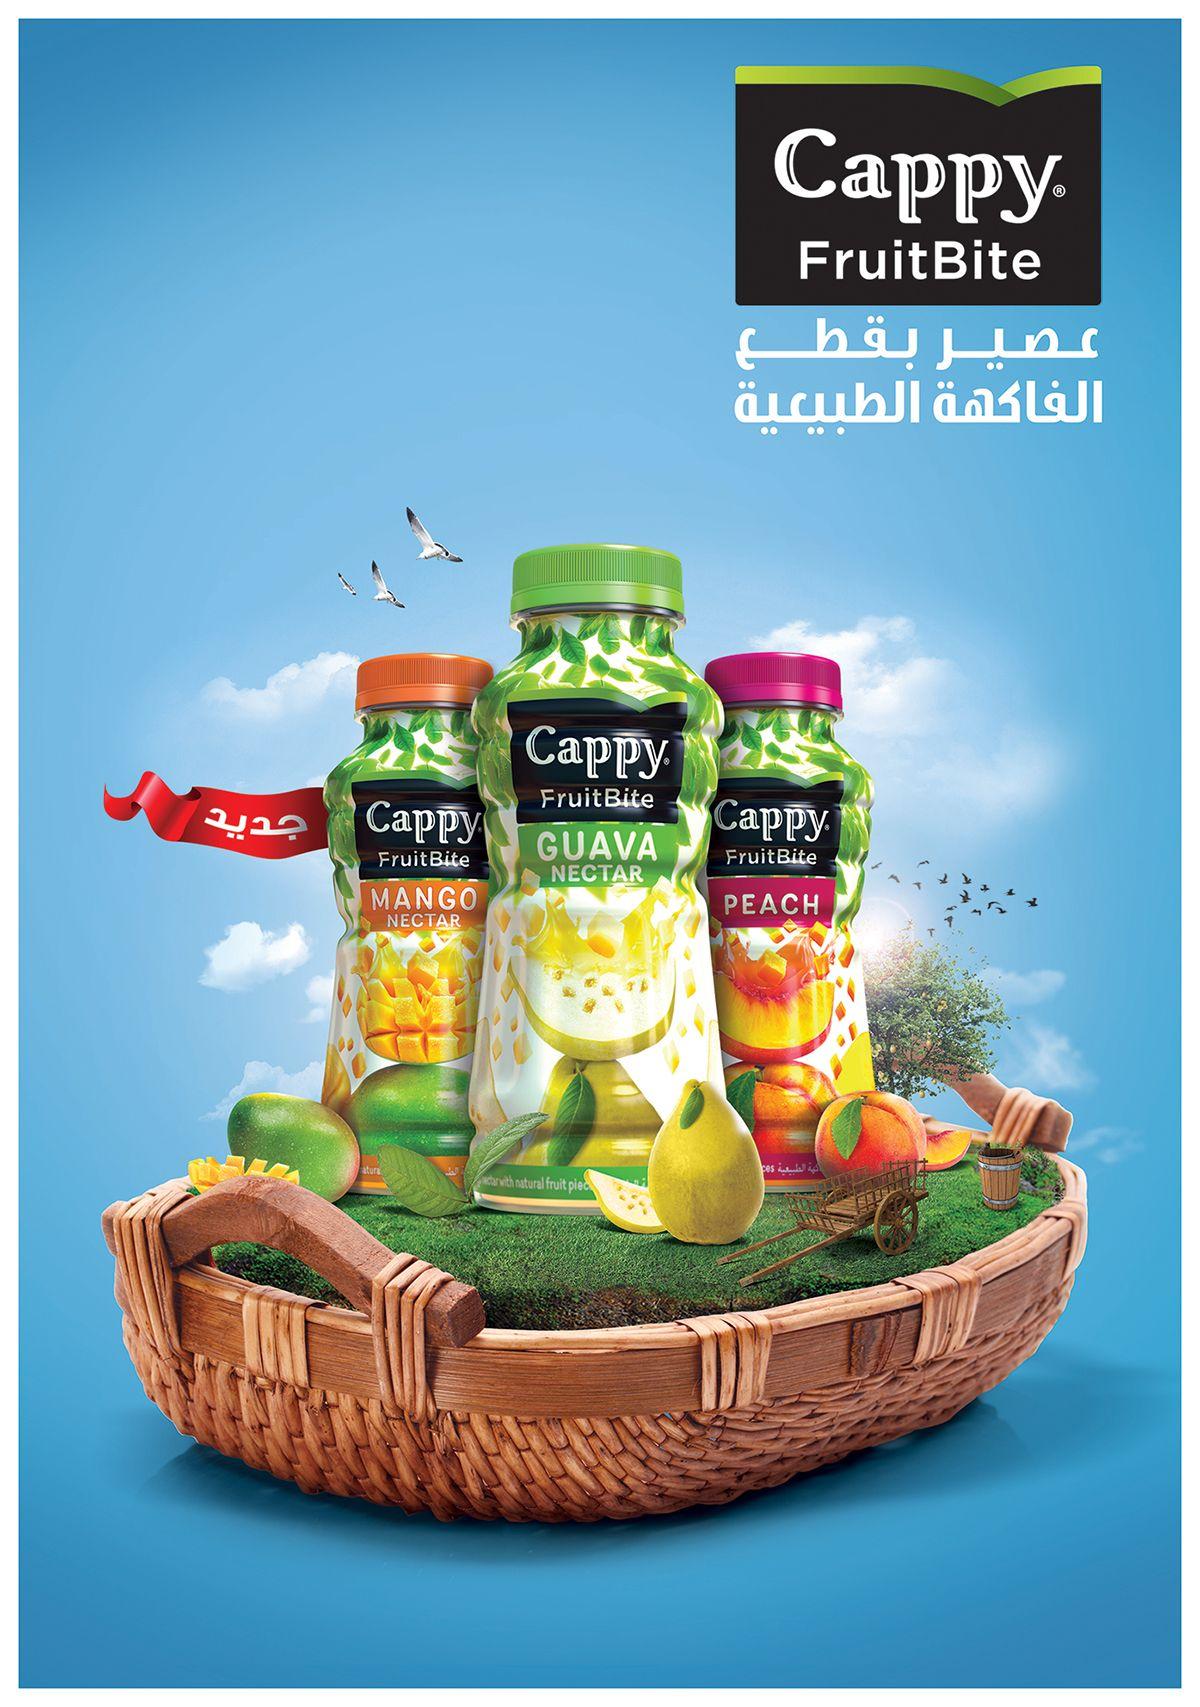 Creative Food Product Advertisement